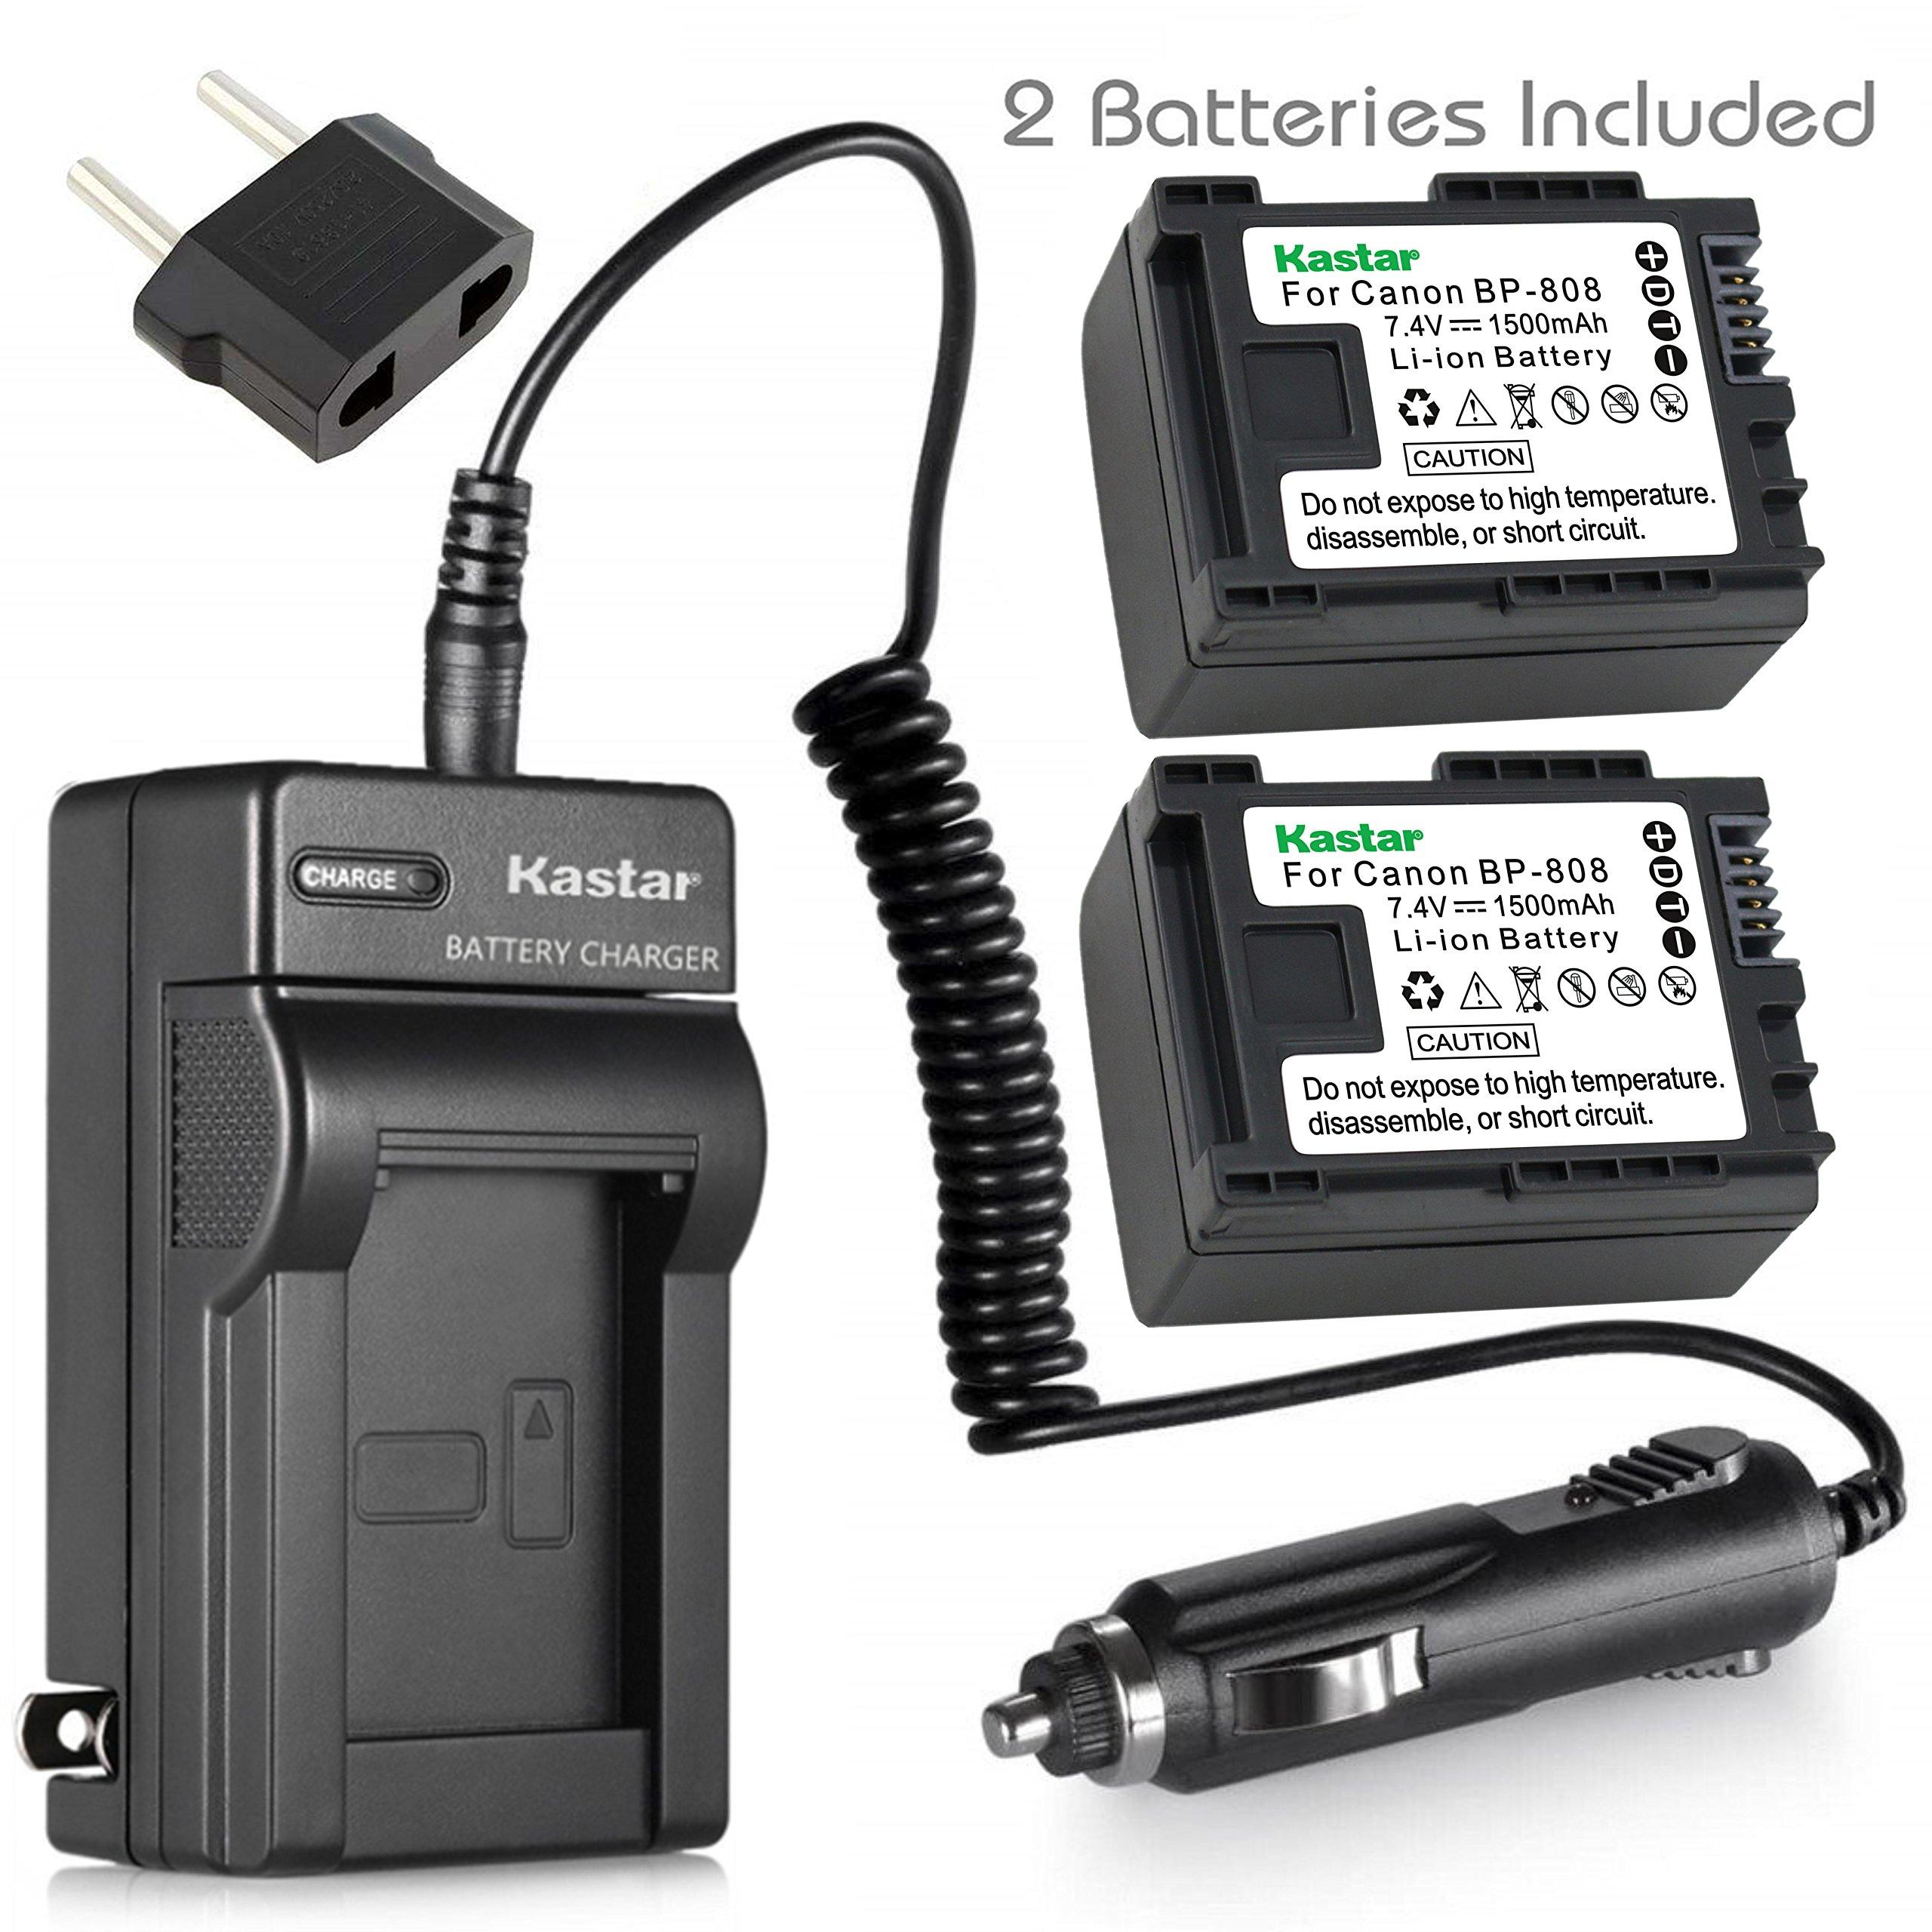 Kastar BP808 Battery (2-Pack) and Charger Kit for Canon BP-807, BP-808, BP-809 and Canon HFM400 HF100 M300 S100 S200 FS36 FS37 HF200 HFS11 HF100 HF20 HG21 FS406 Cameras